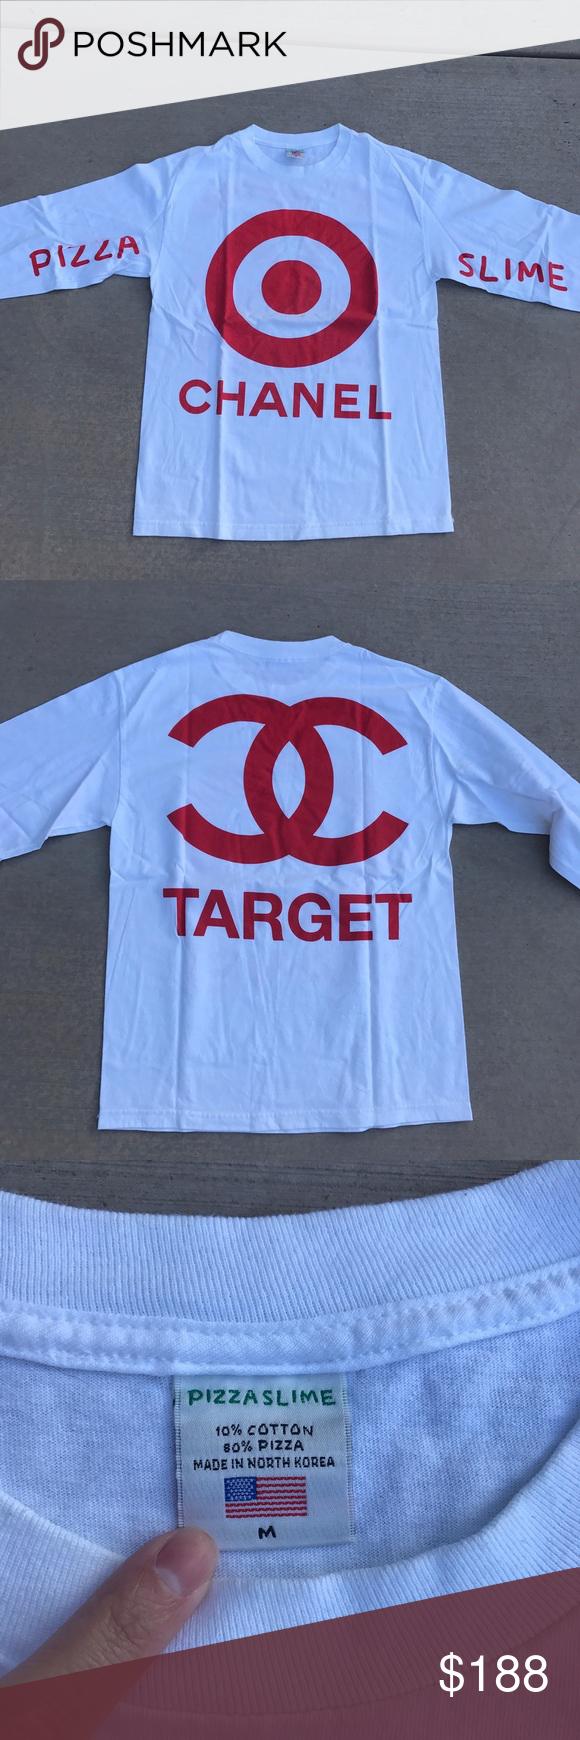 f6b5f3b9ce Long Sleeve Tee Shirts Target